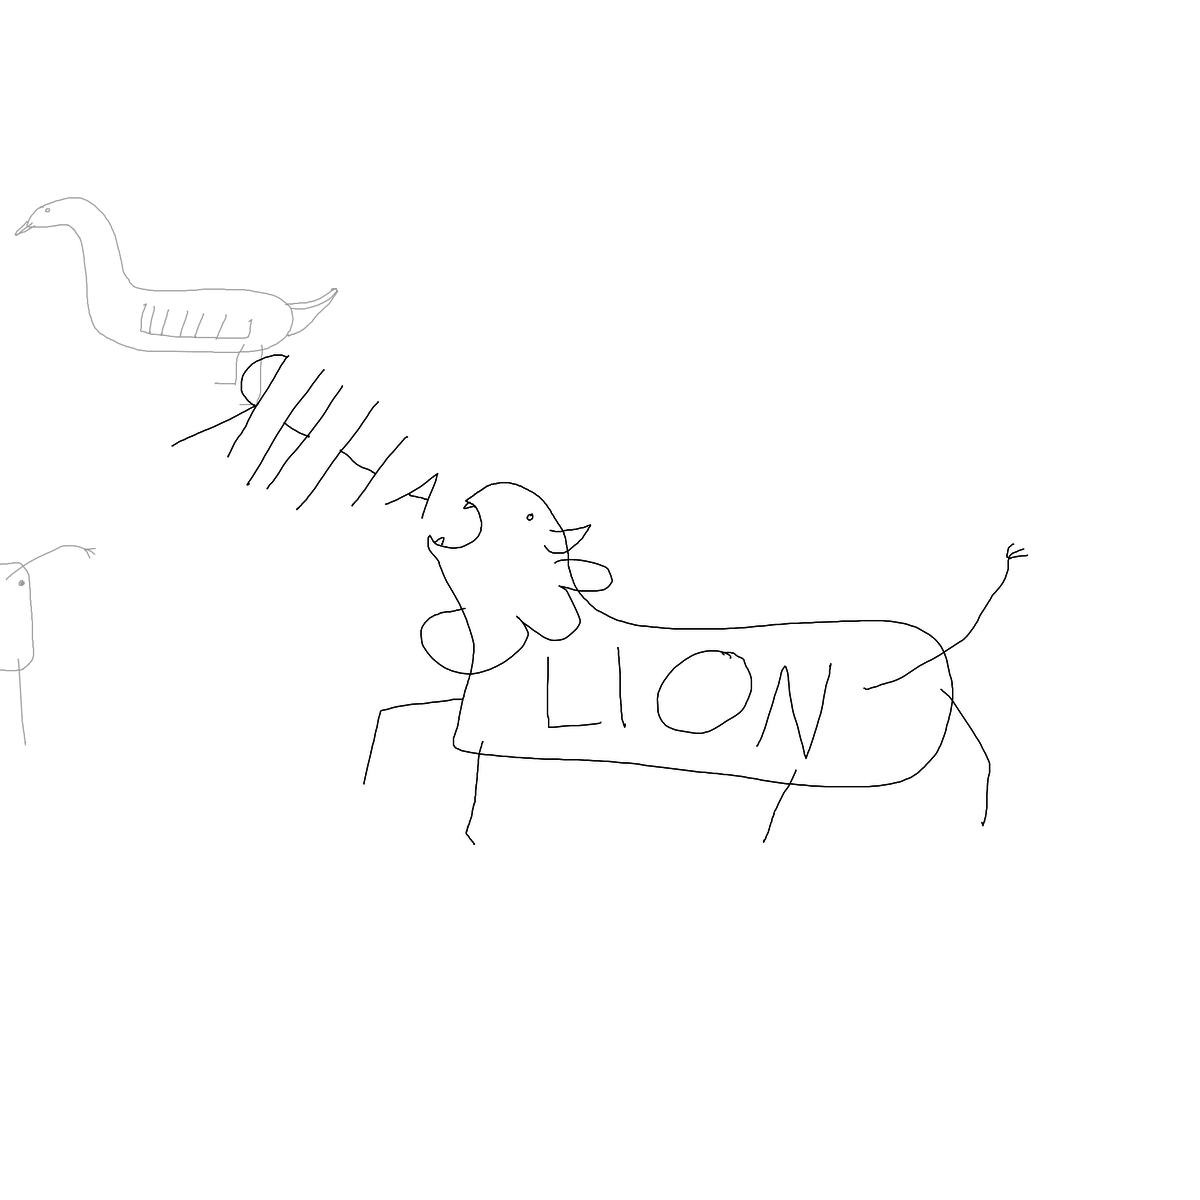 BAAAM drawing#2145 lat:52.4750213623046900lng: 13.4068803787231450